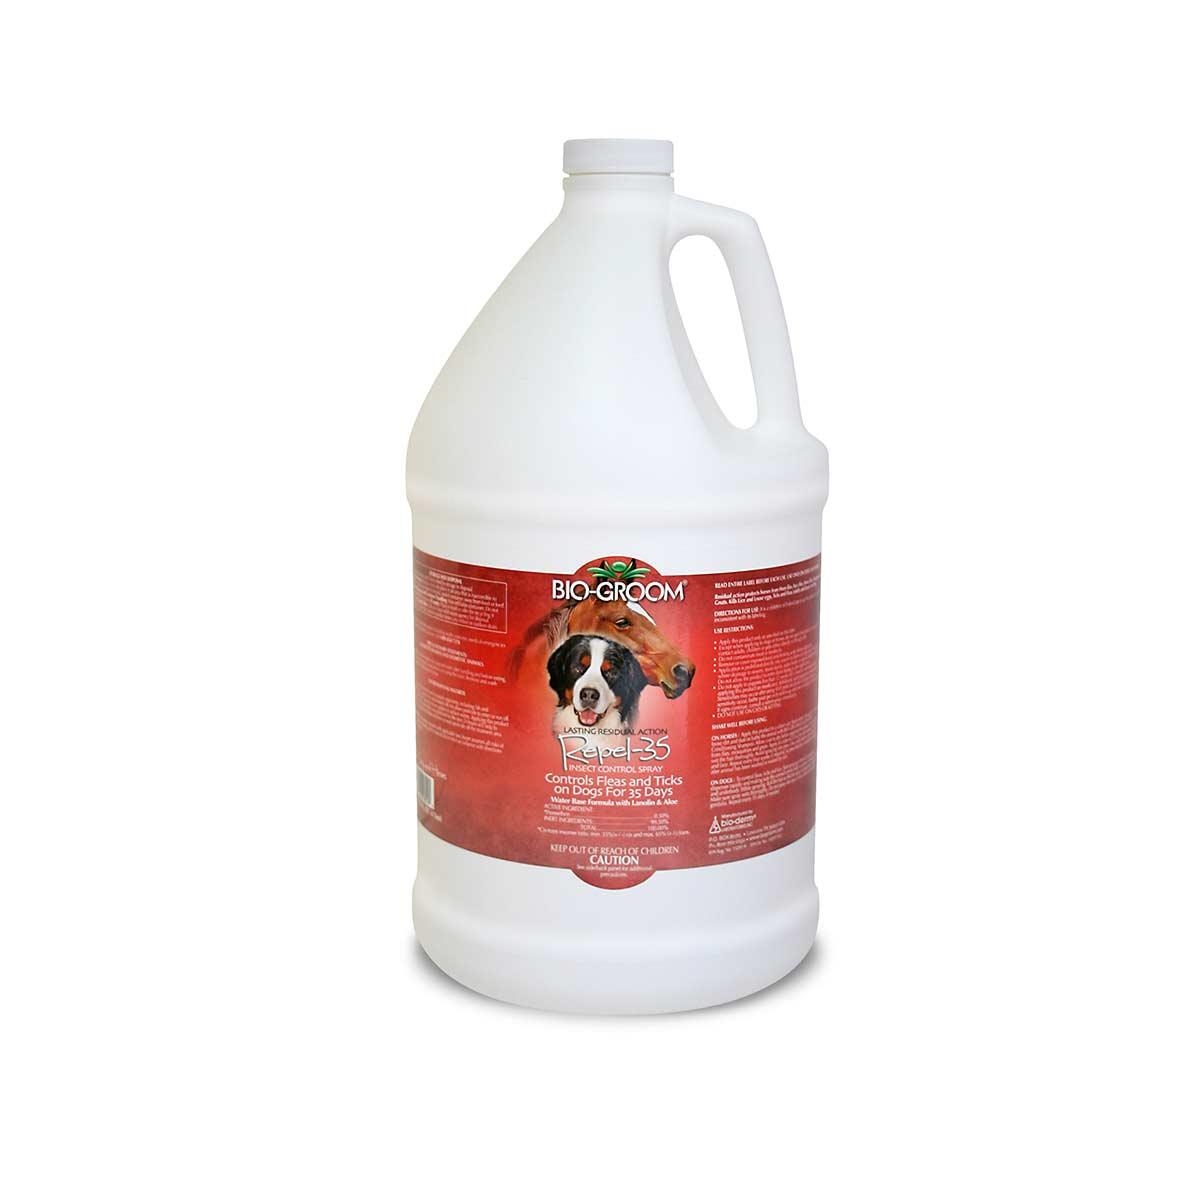 Gallon Bio-Groom Repel-35